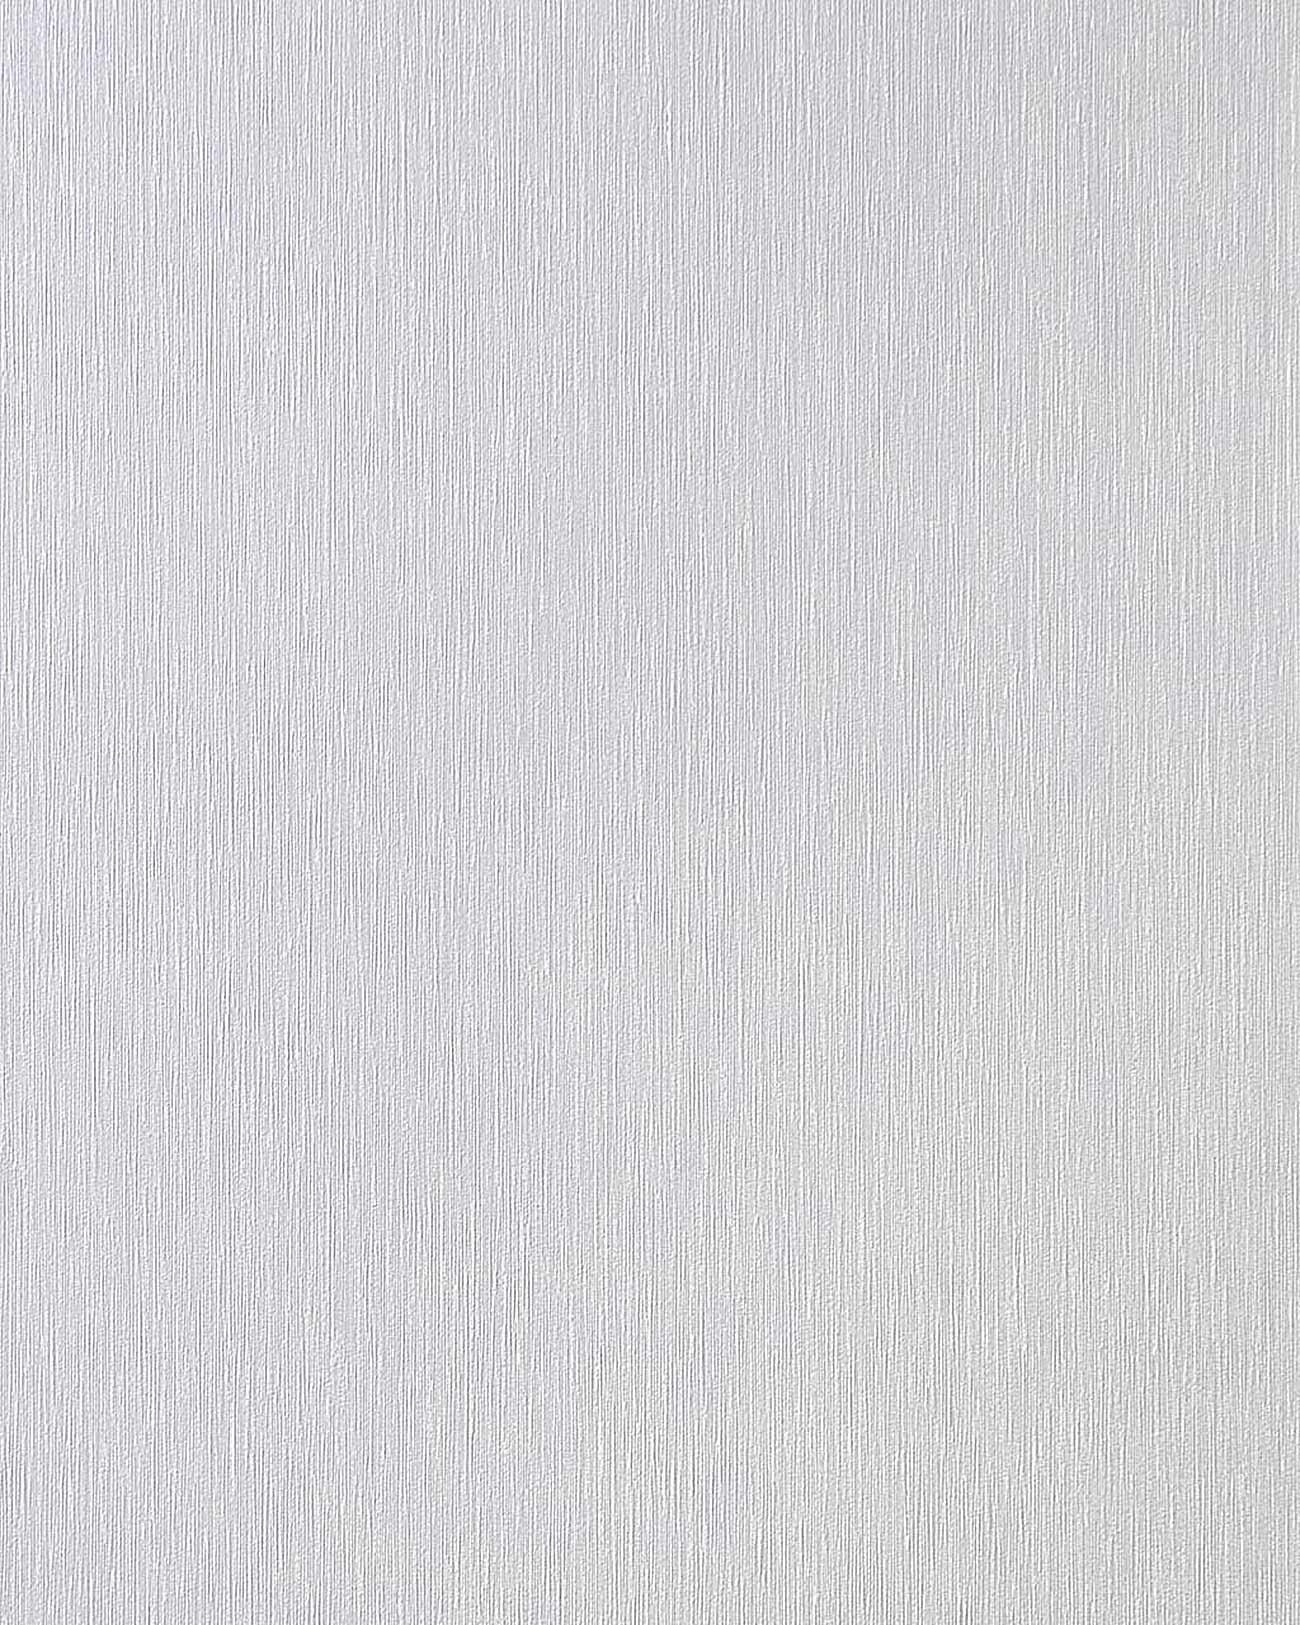 Elegant Wallpaper Designs